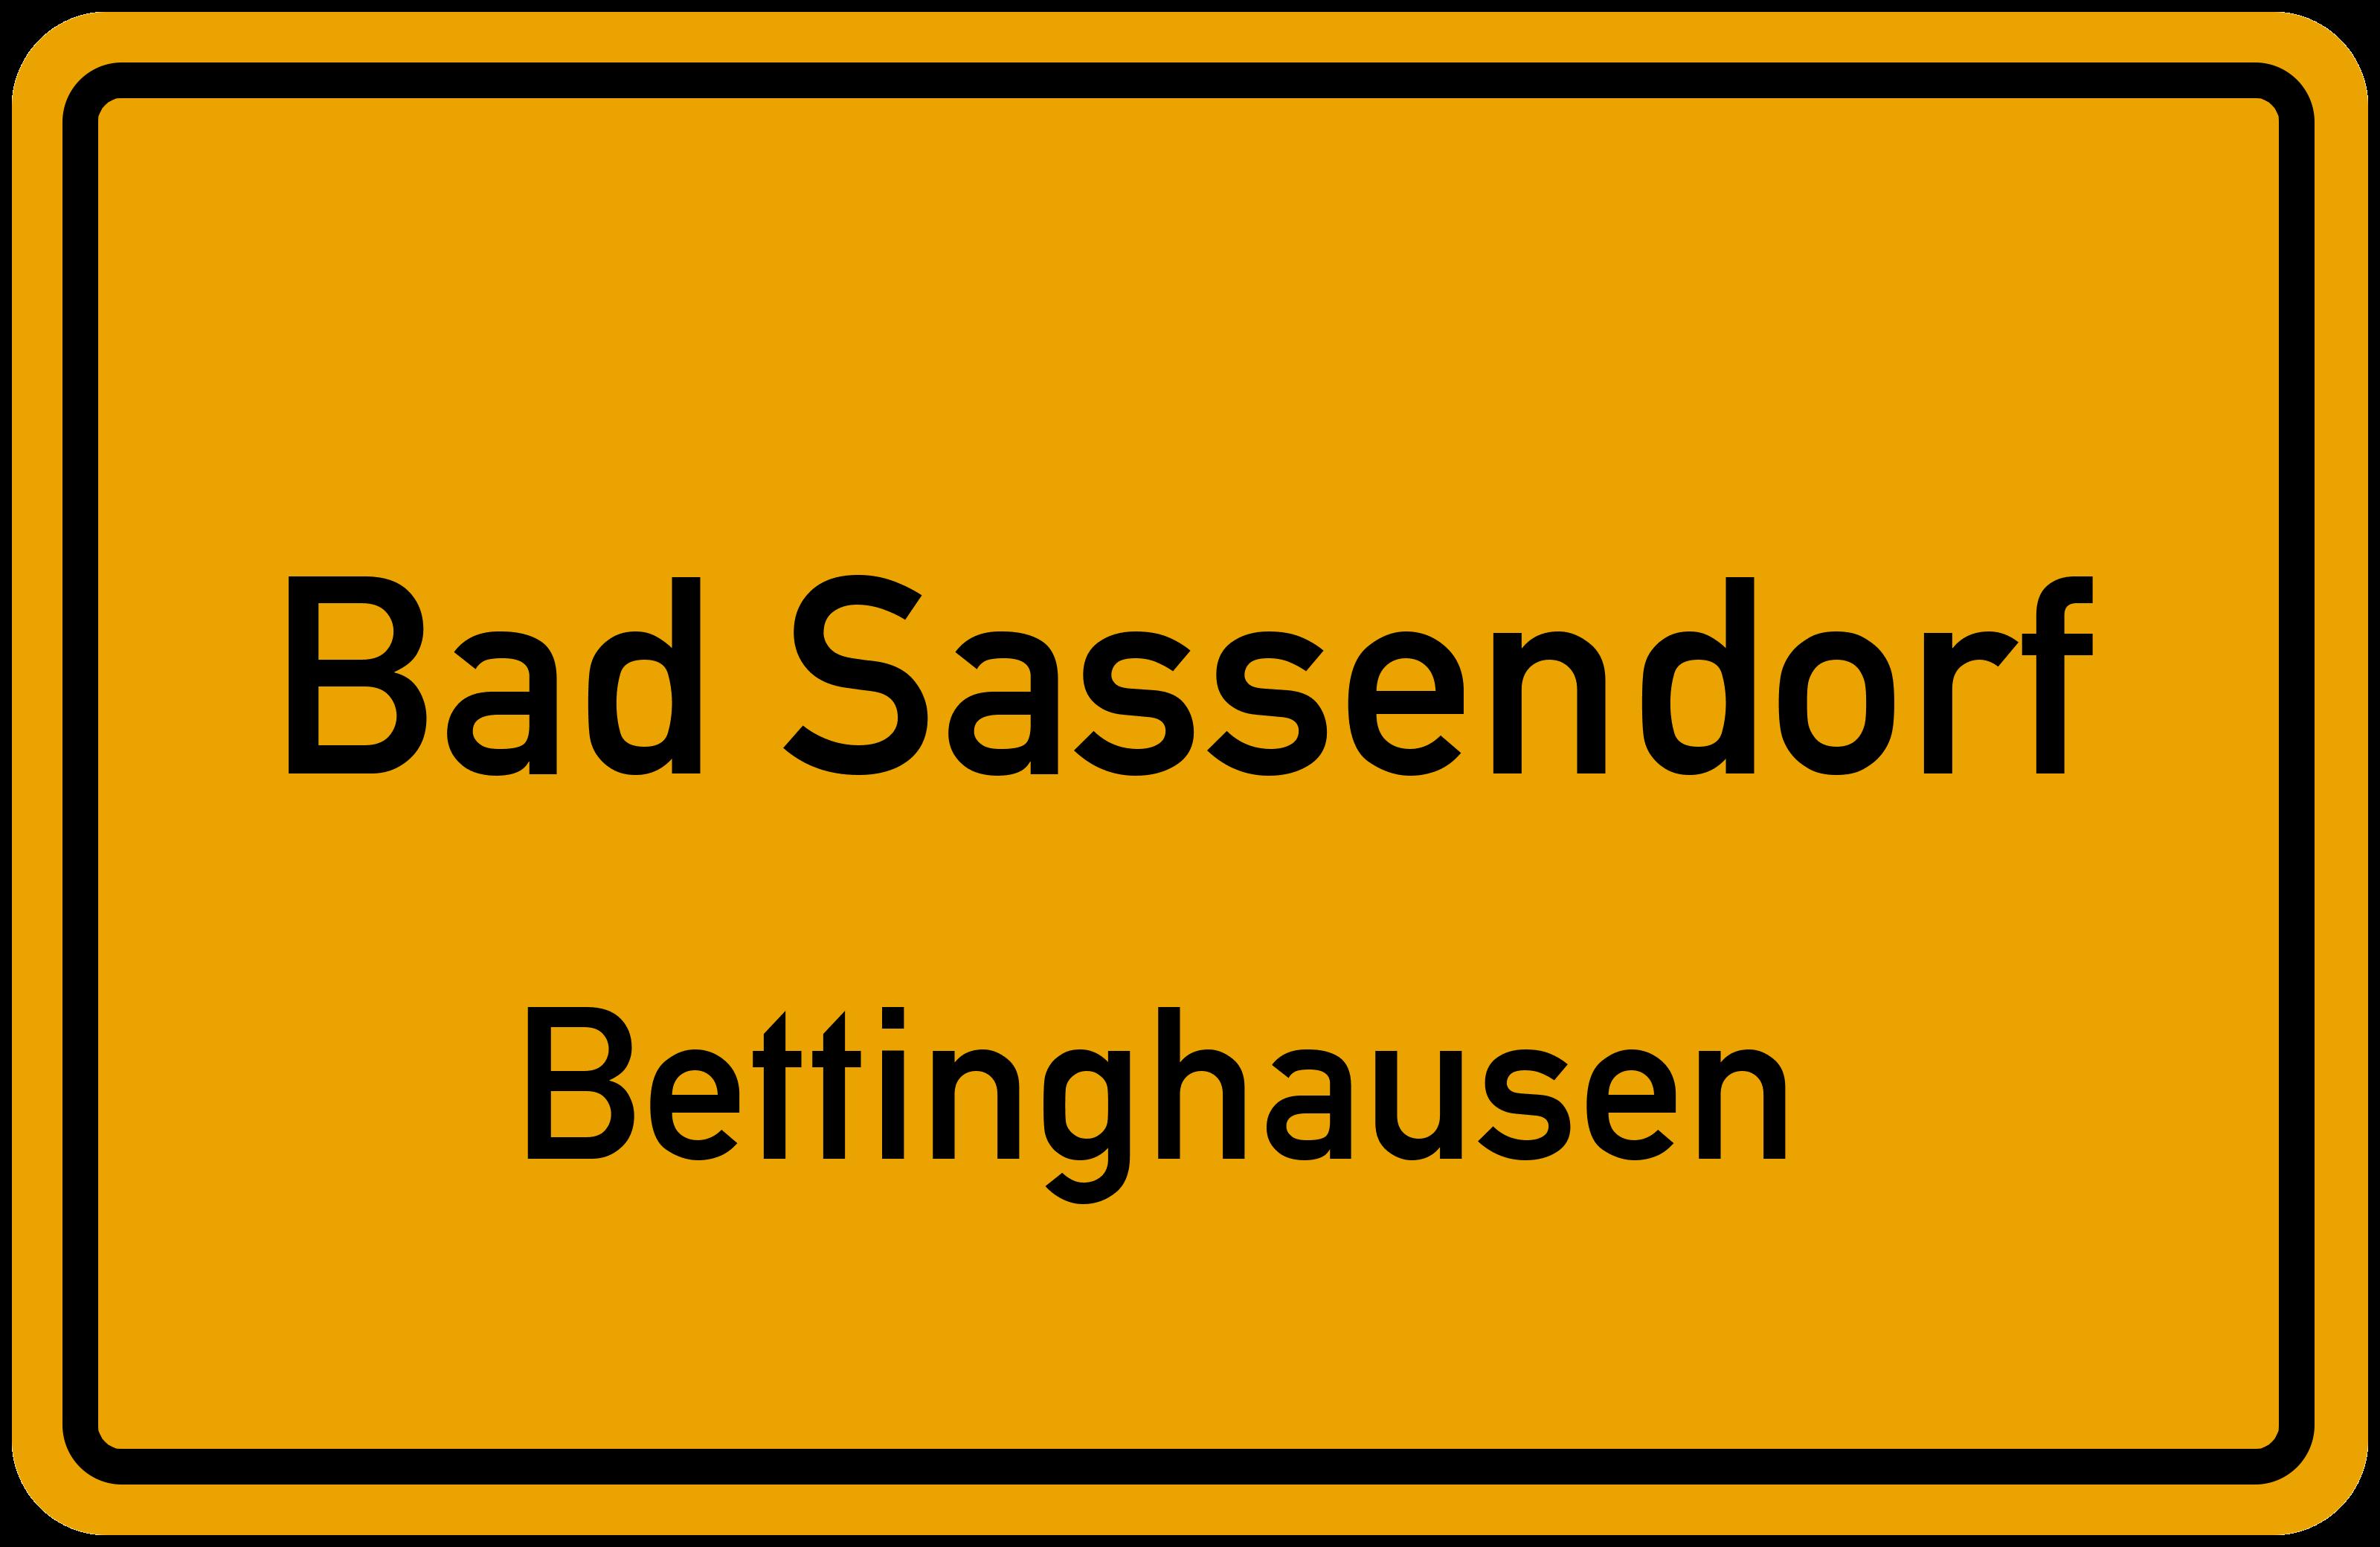 Bettinghausen bad sassendorf pension 3 way match betting system